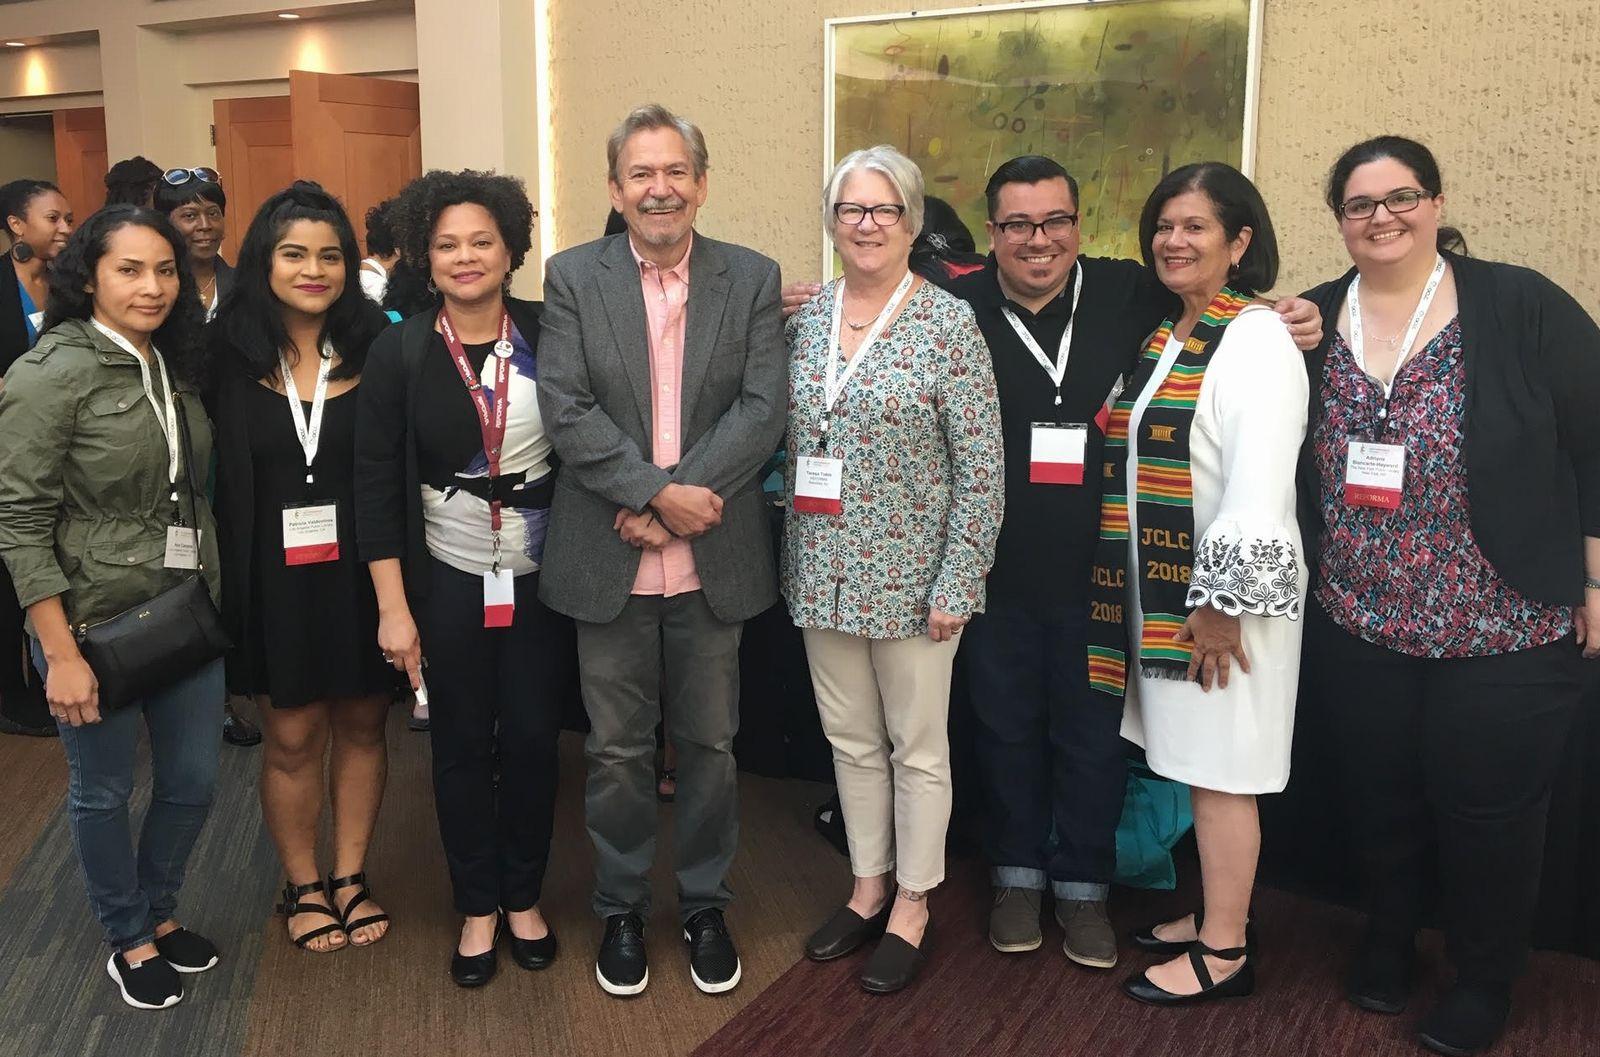 benjamin alire with reforma members at jclc 2018